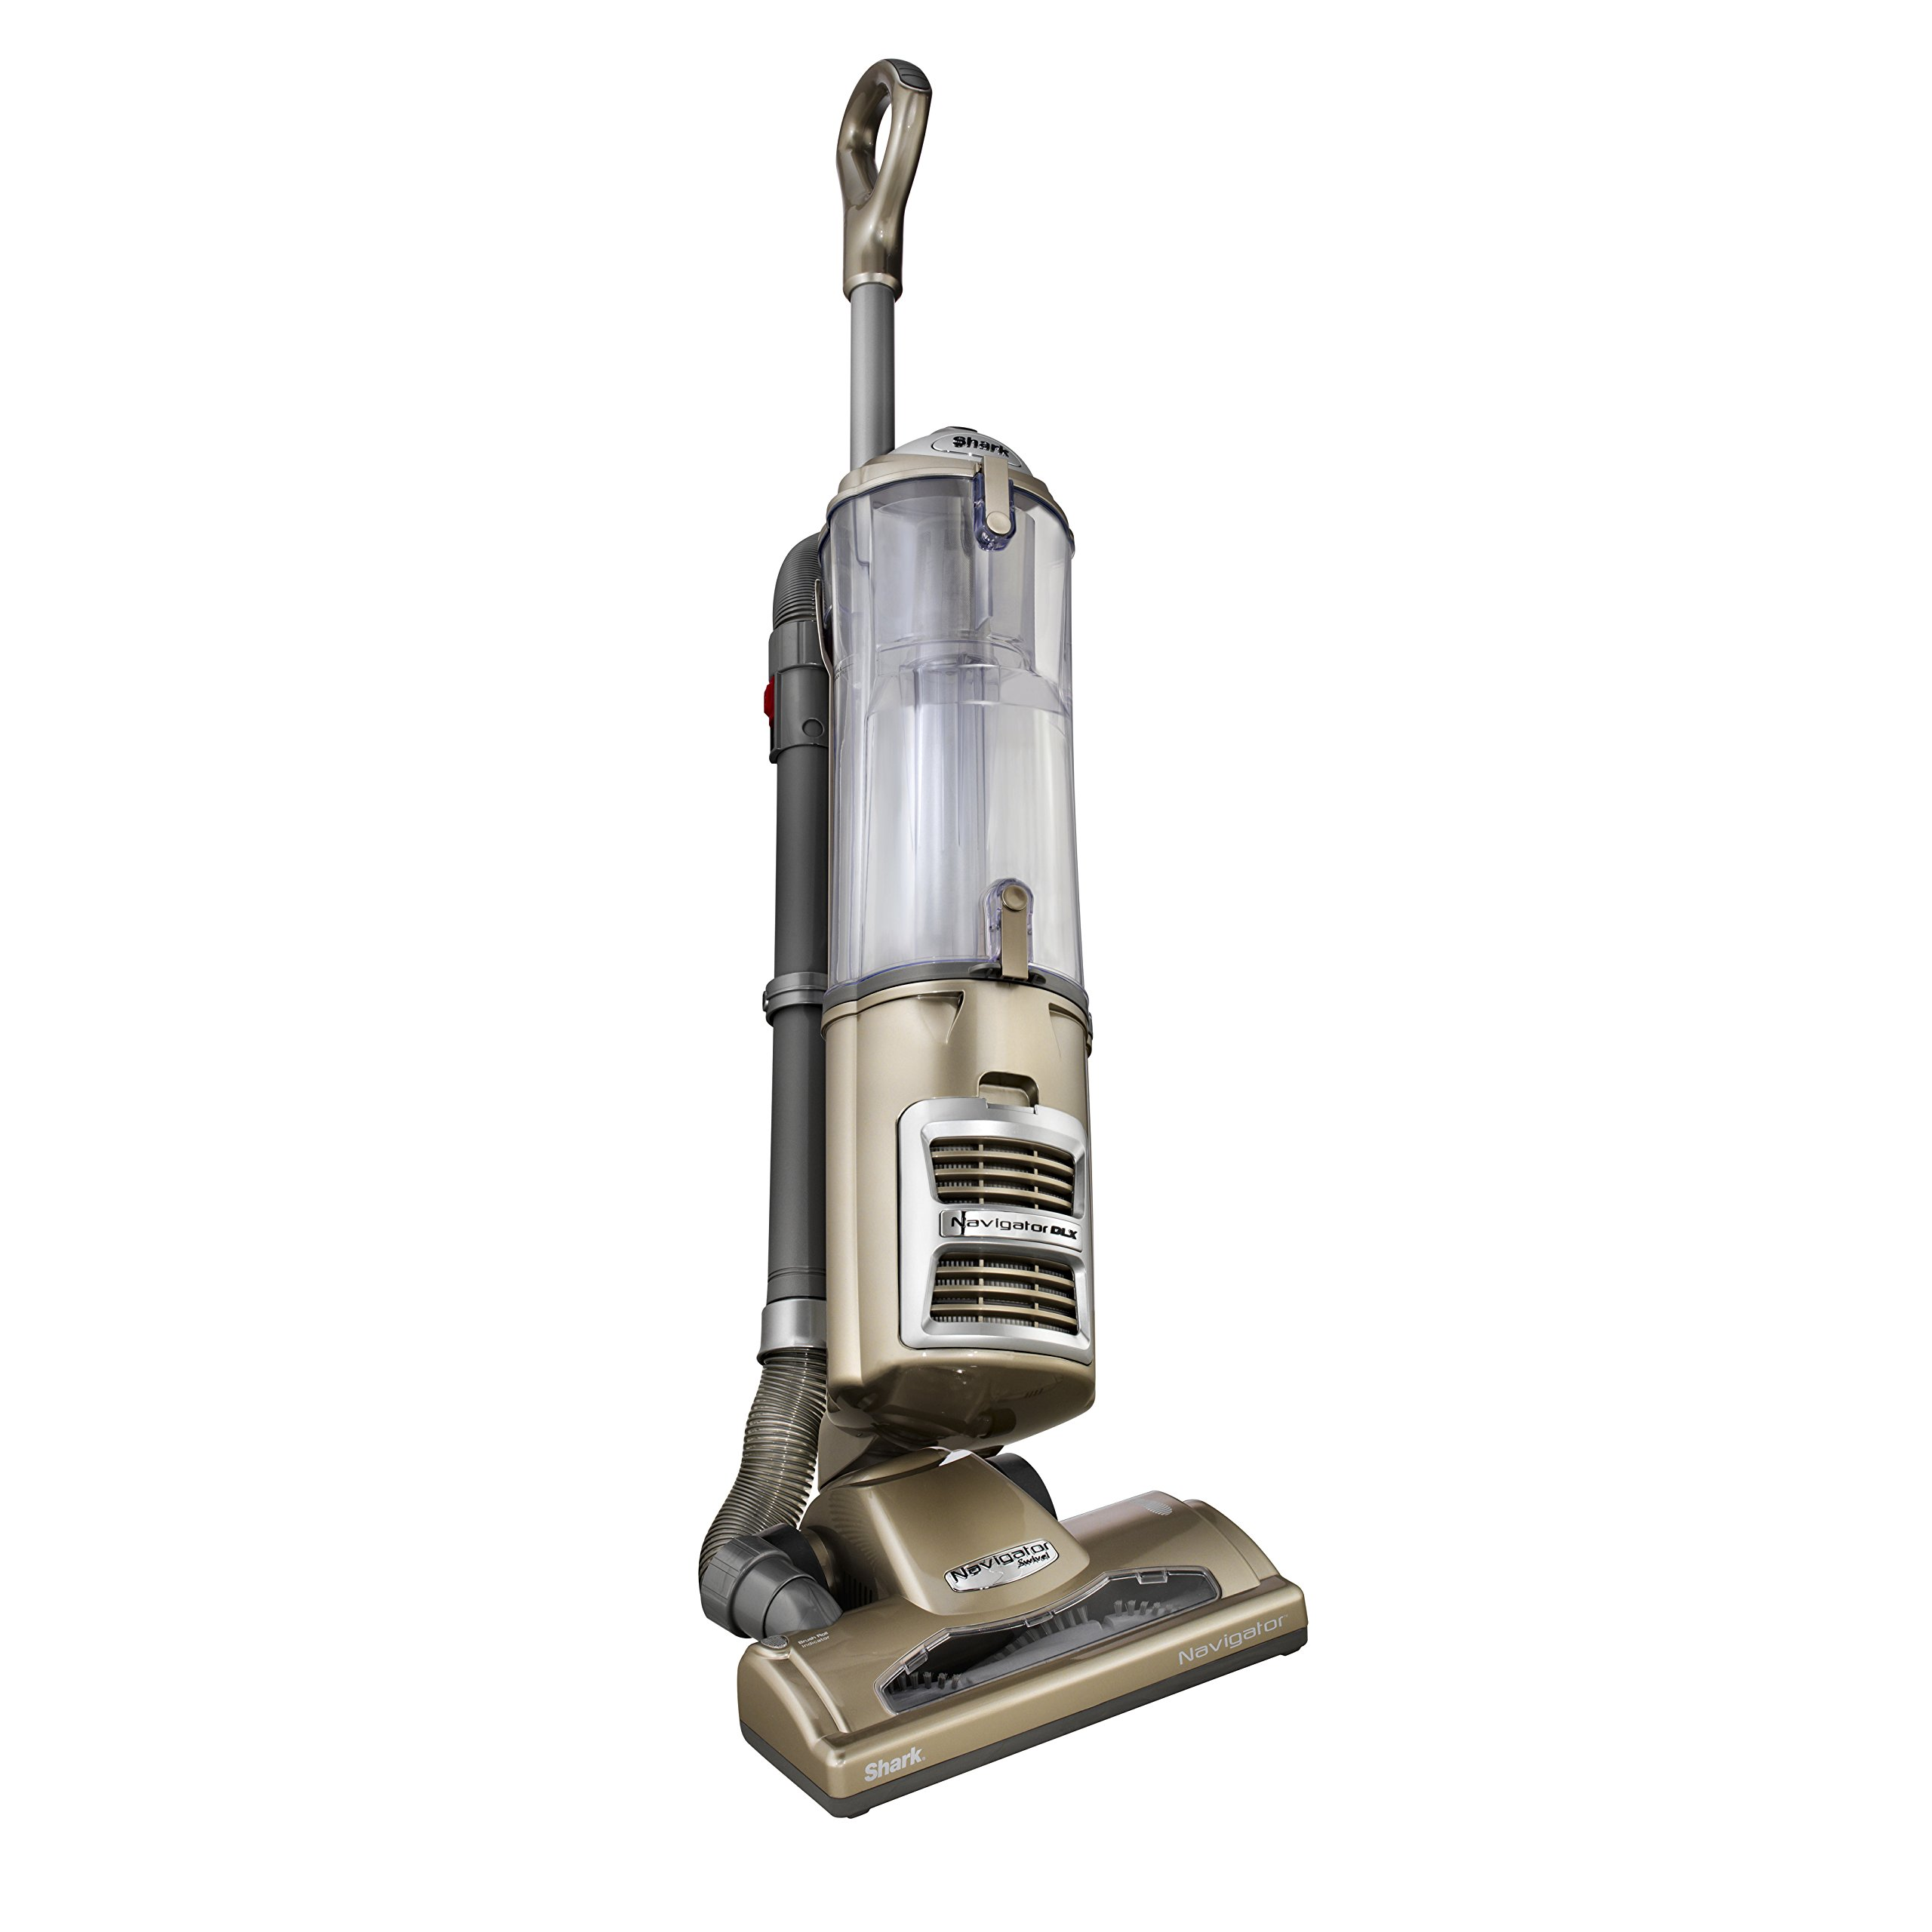 Shark Navigator Professional Upright Vacuum, Gold and Silver (NV70) by SharkNinja (Image #4)